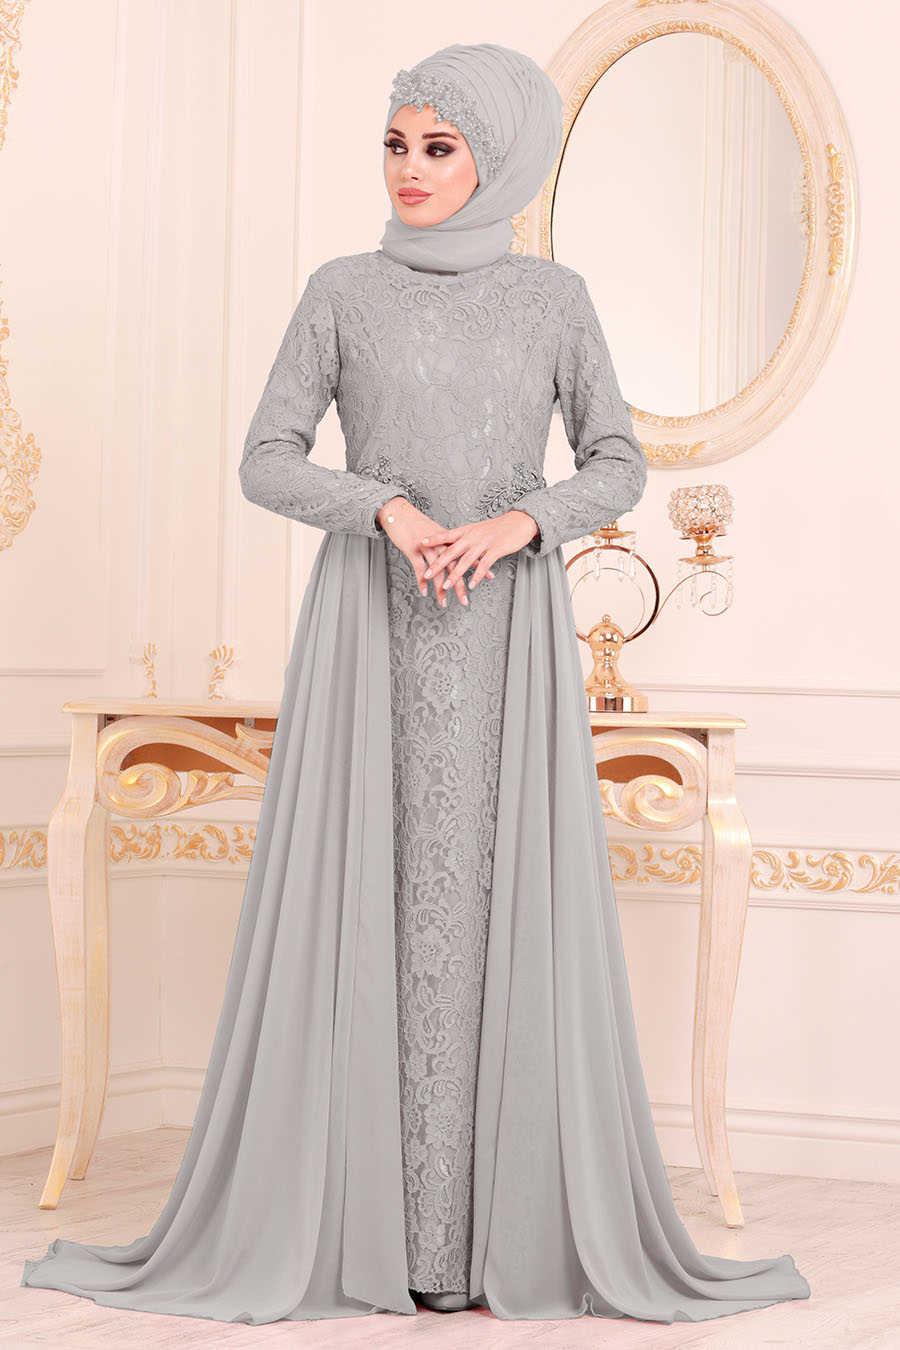 Neva Style Grey Hijab Evening Dress 9105gr